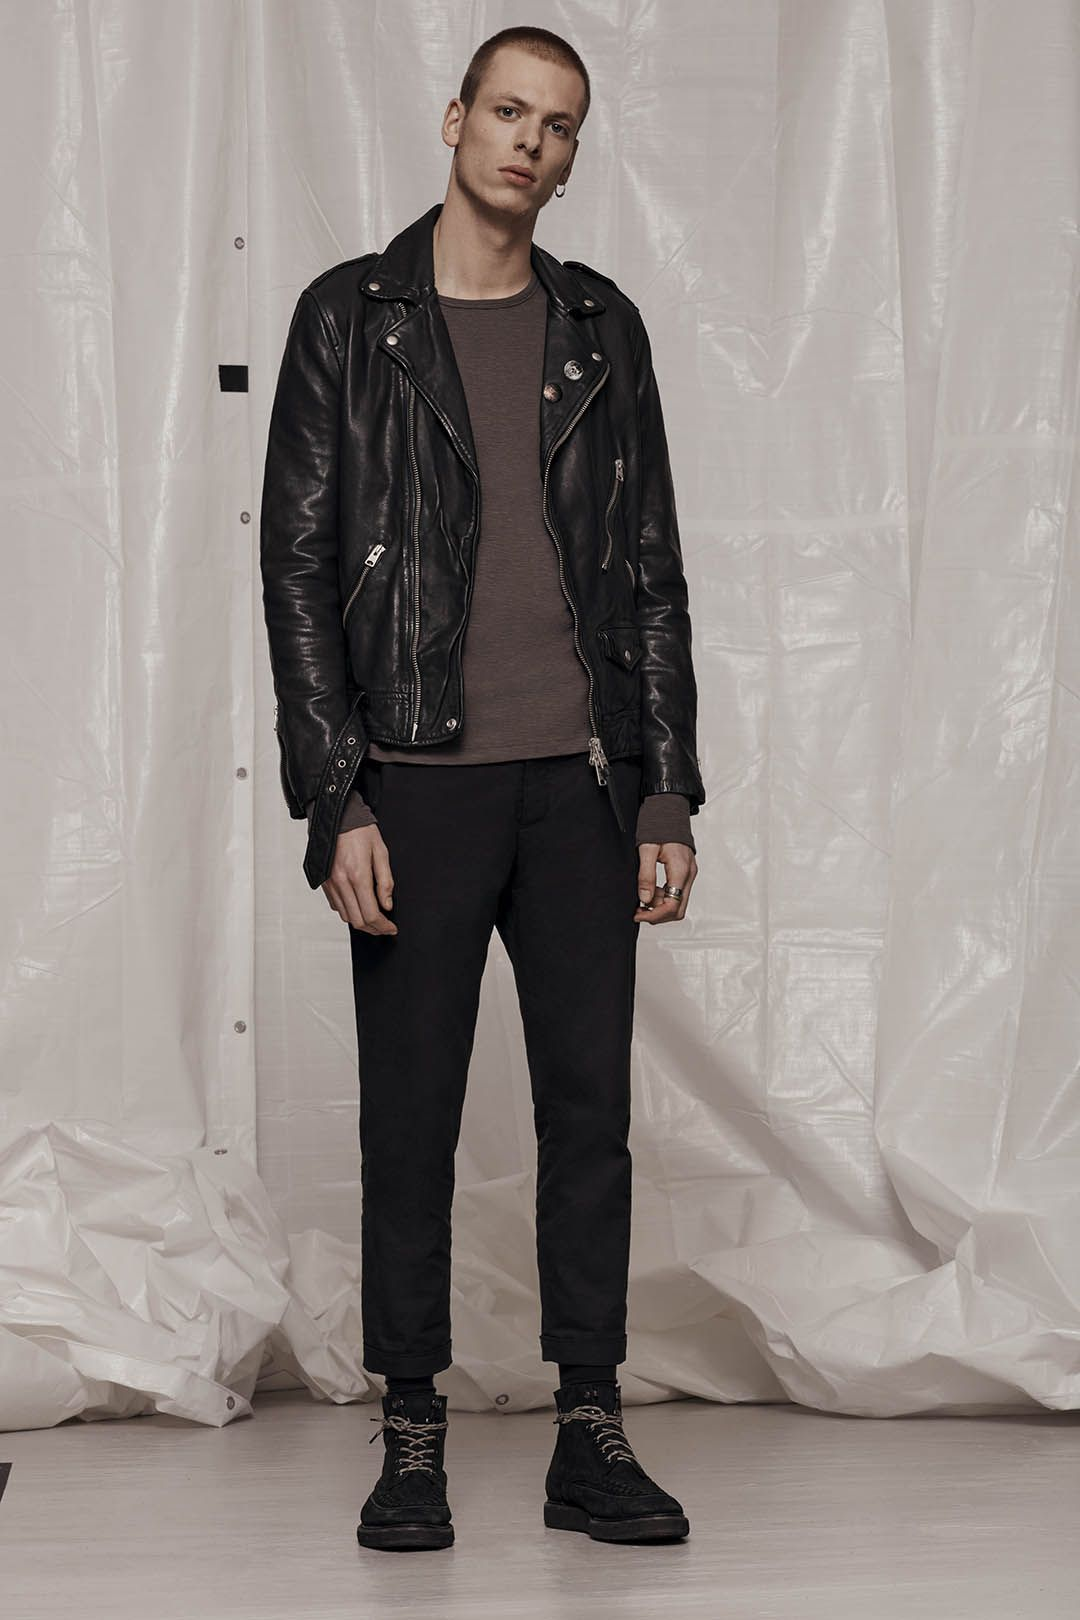 Allsaints Men S January Lookbook Look 5 Volt Leather